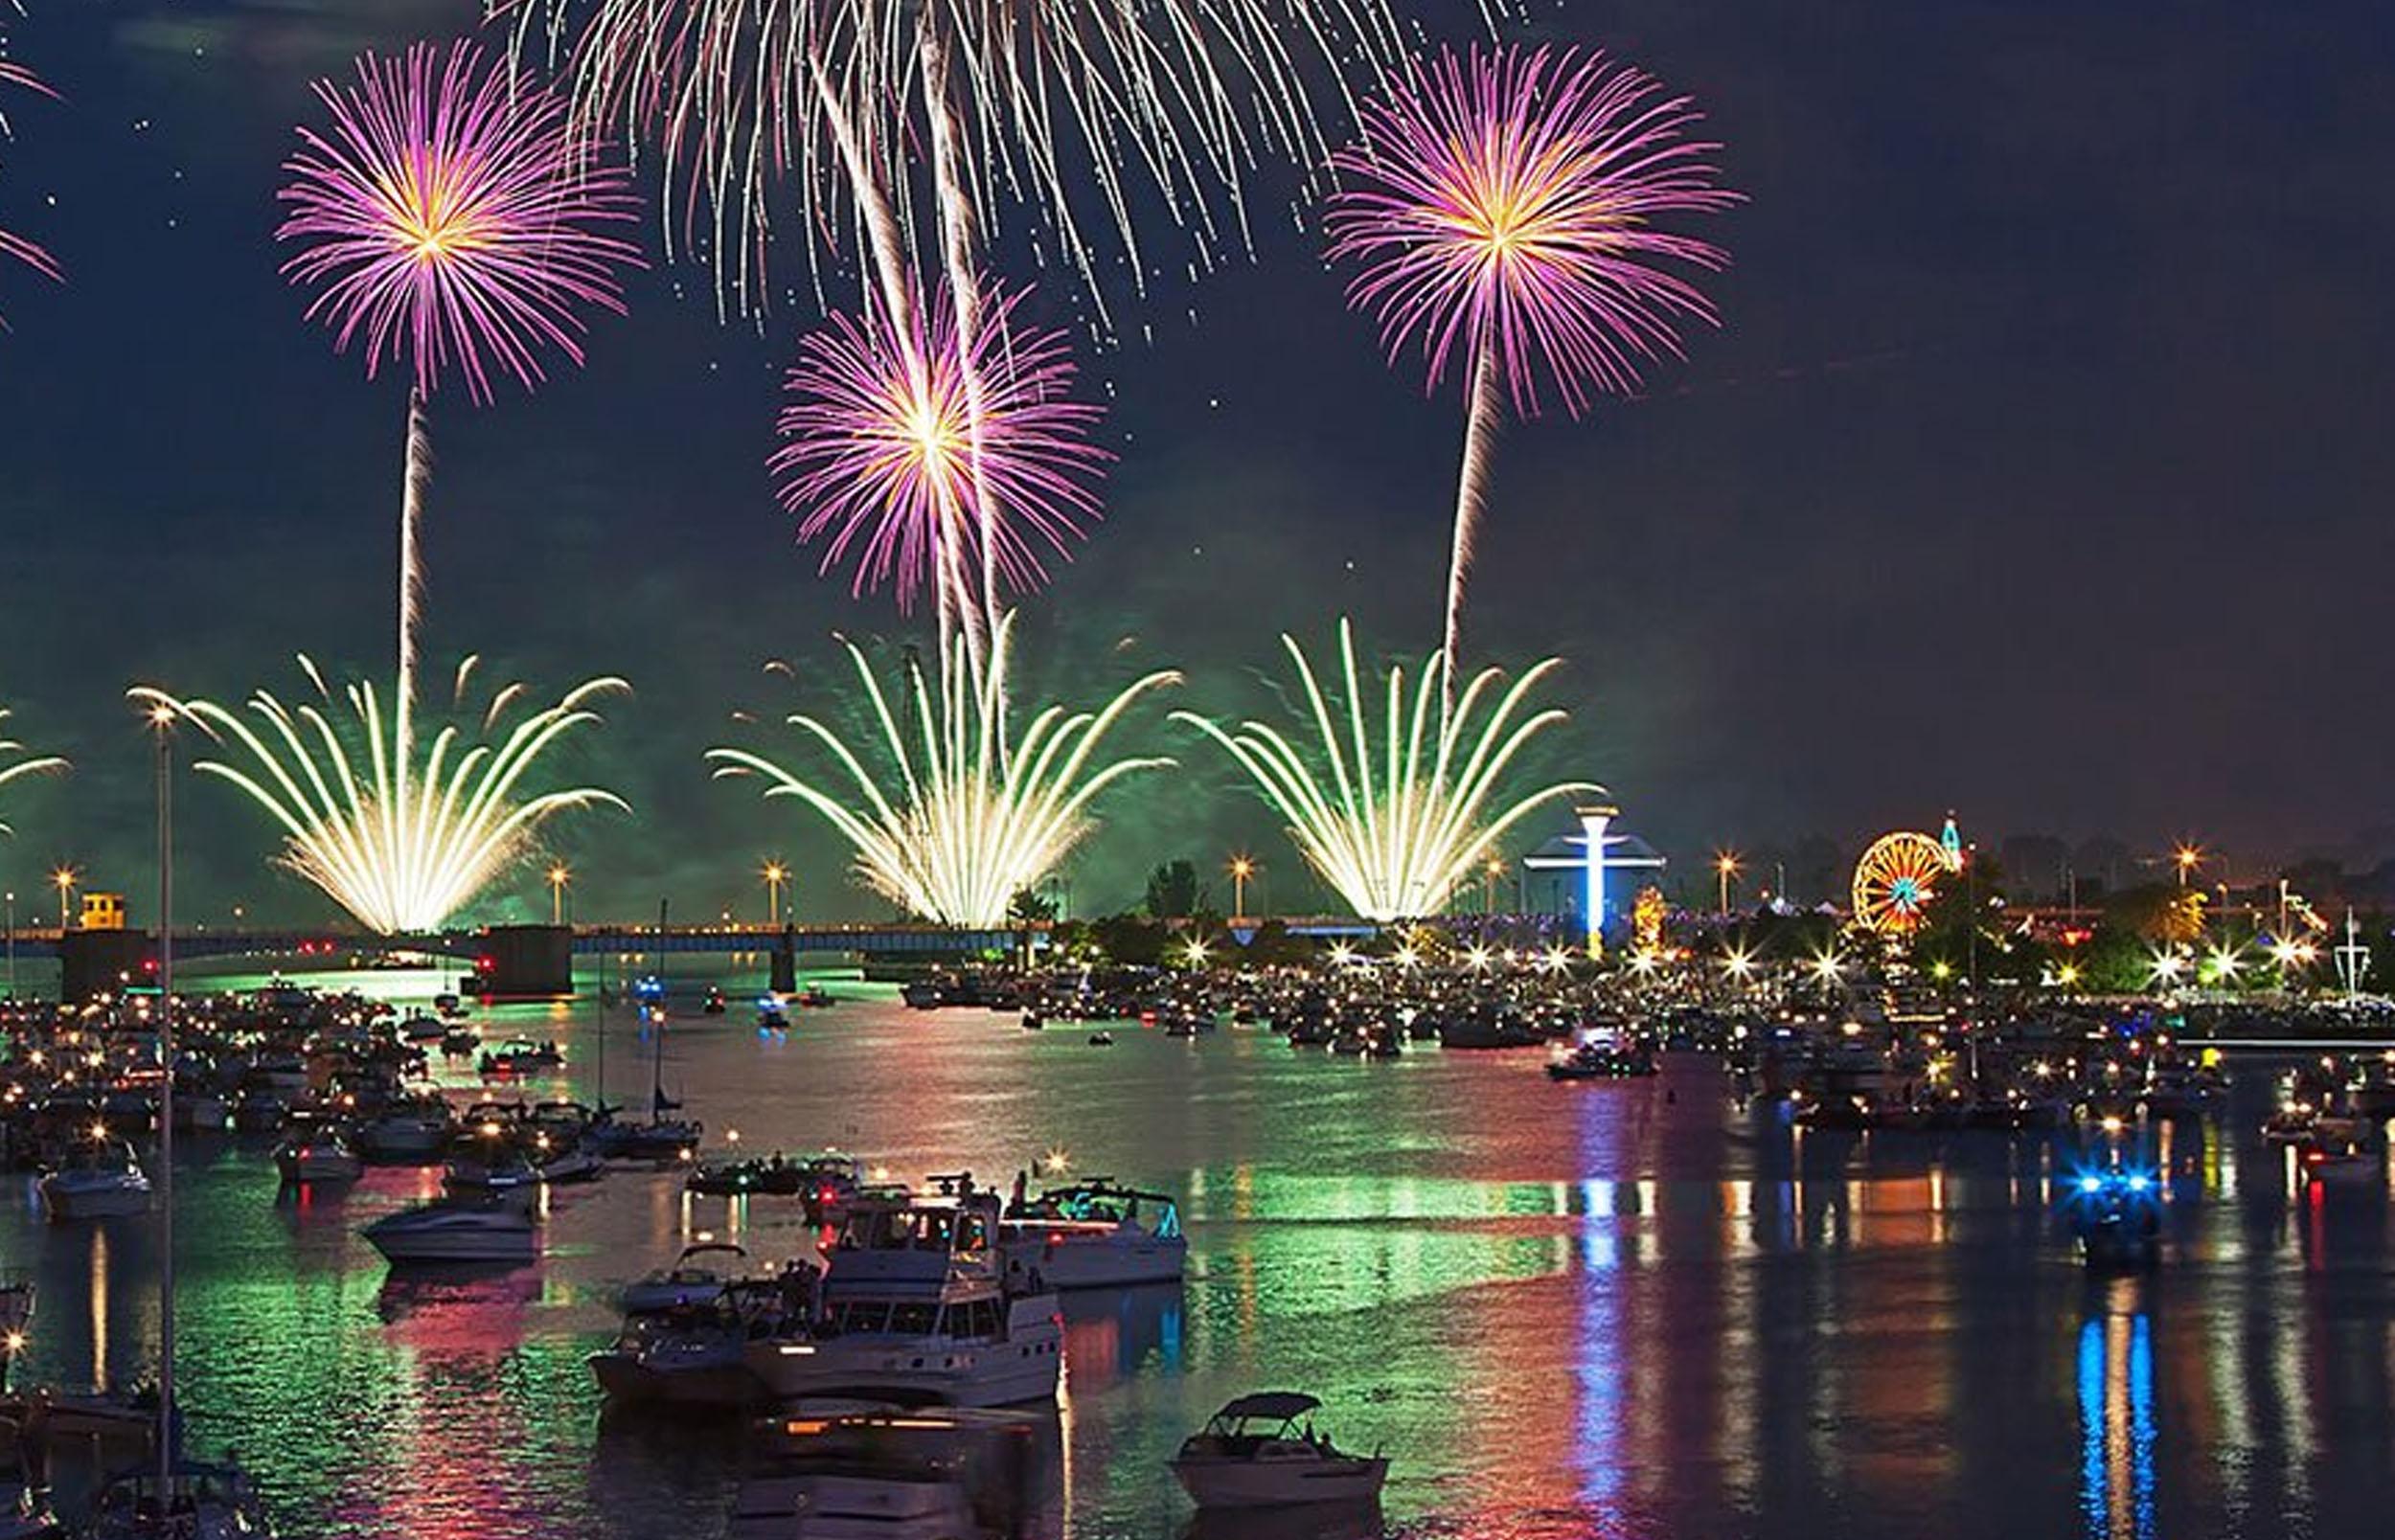 Source:http://www.downtownbaycity.com/events/bay-city-fireworks-festival/